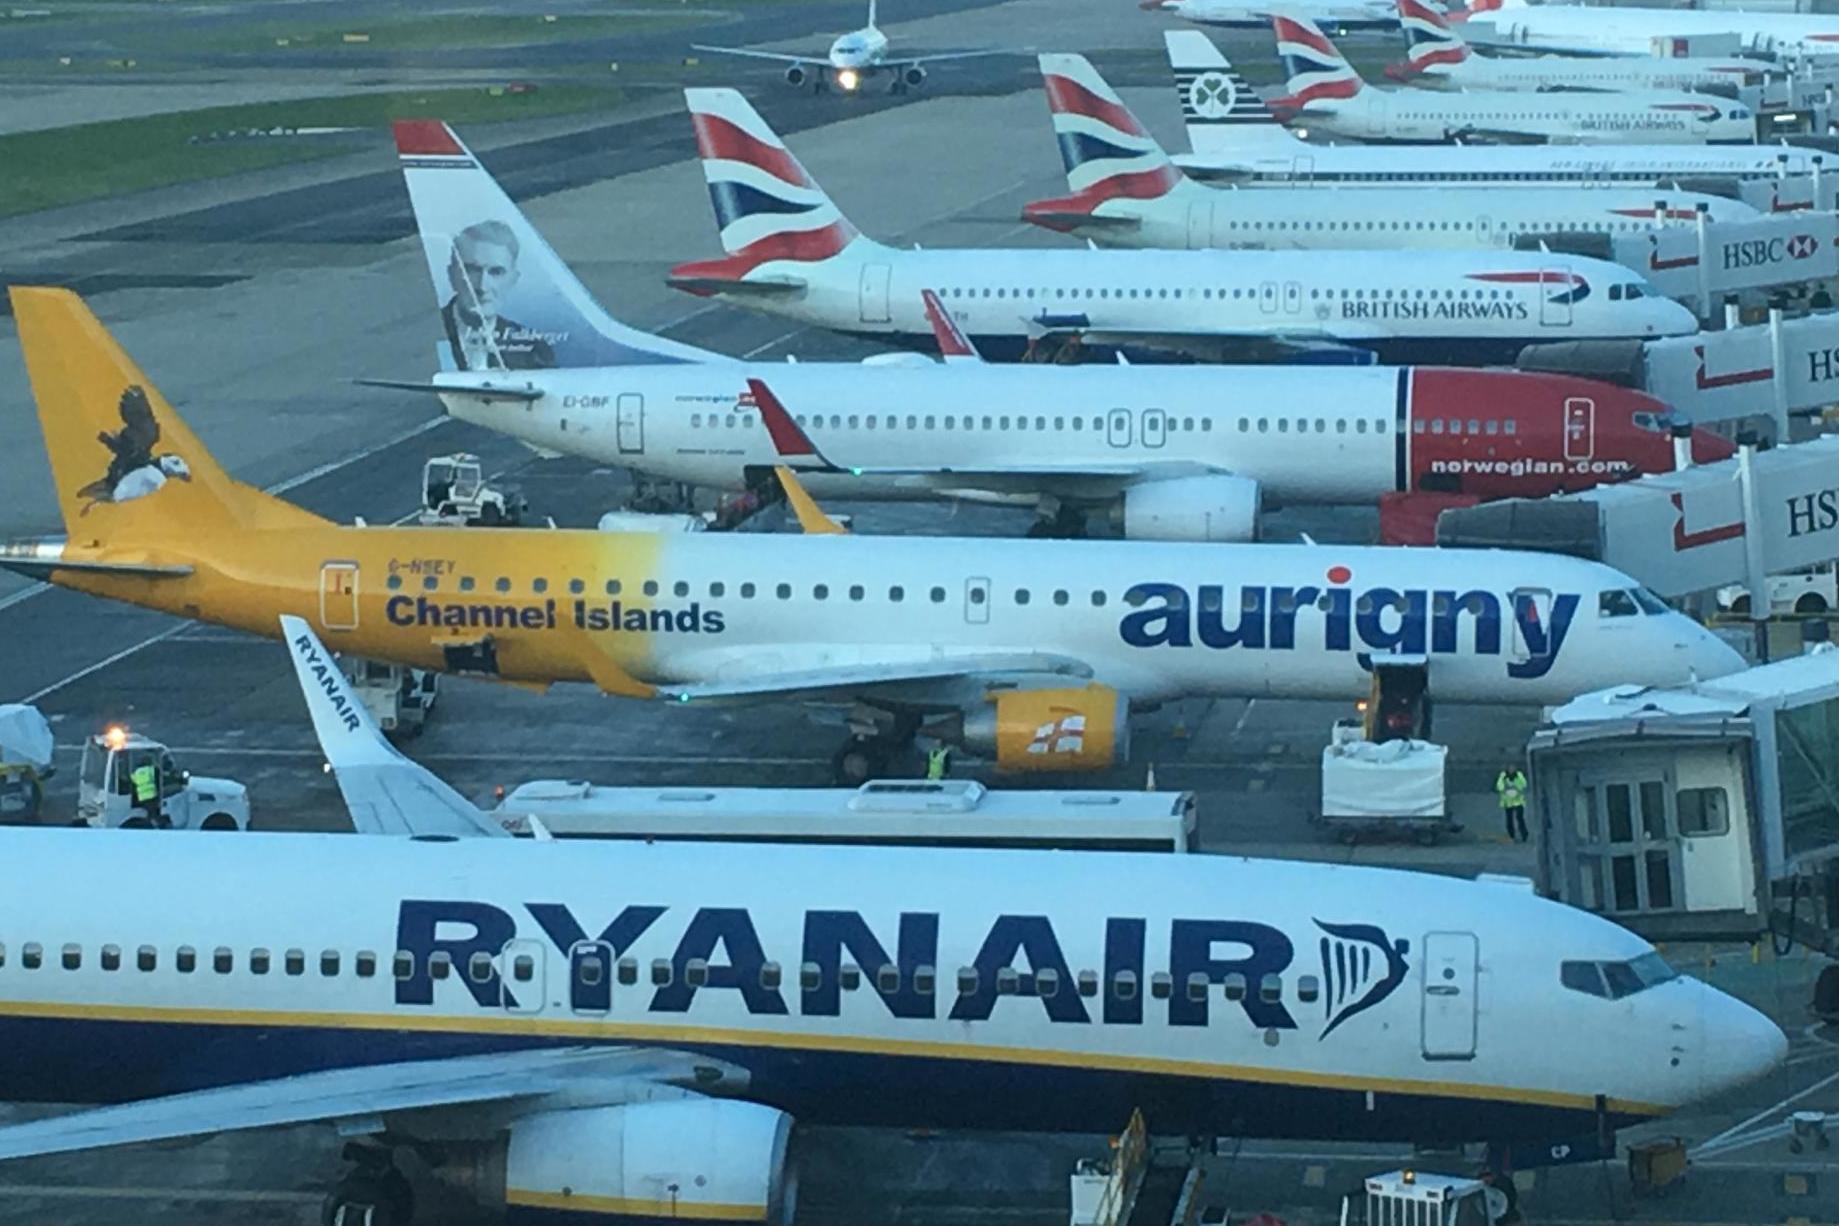 Travel industry bosses demand progress and a fresh Brexit referendum